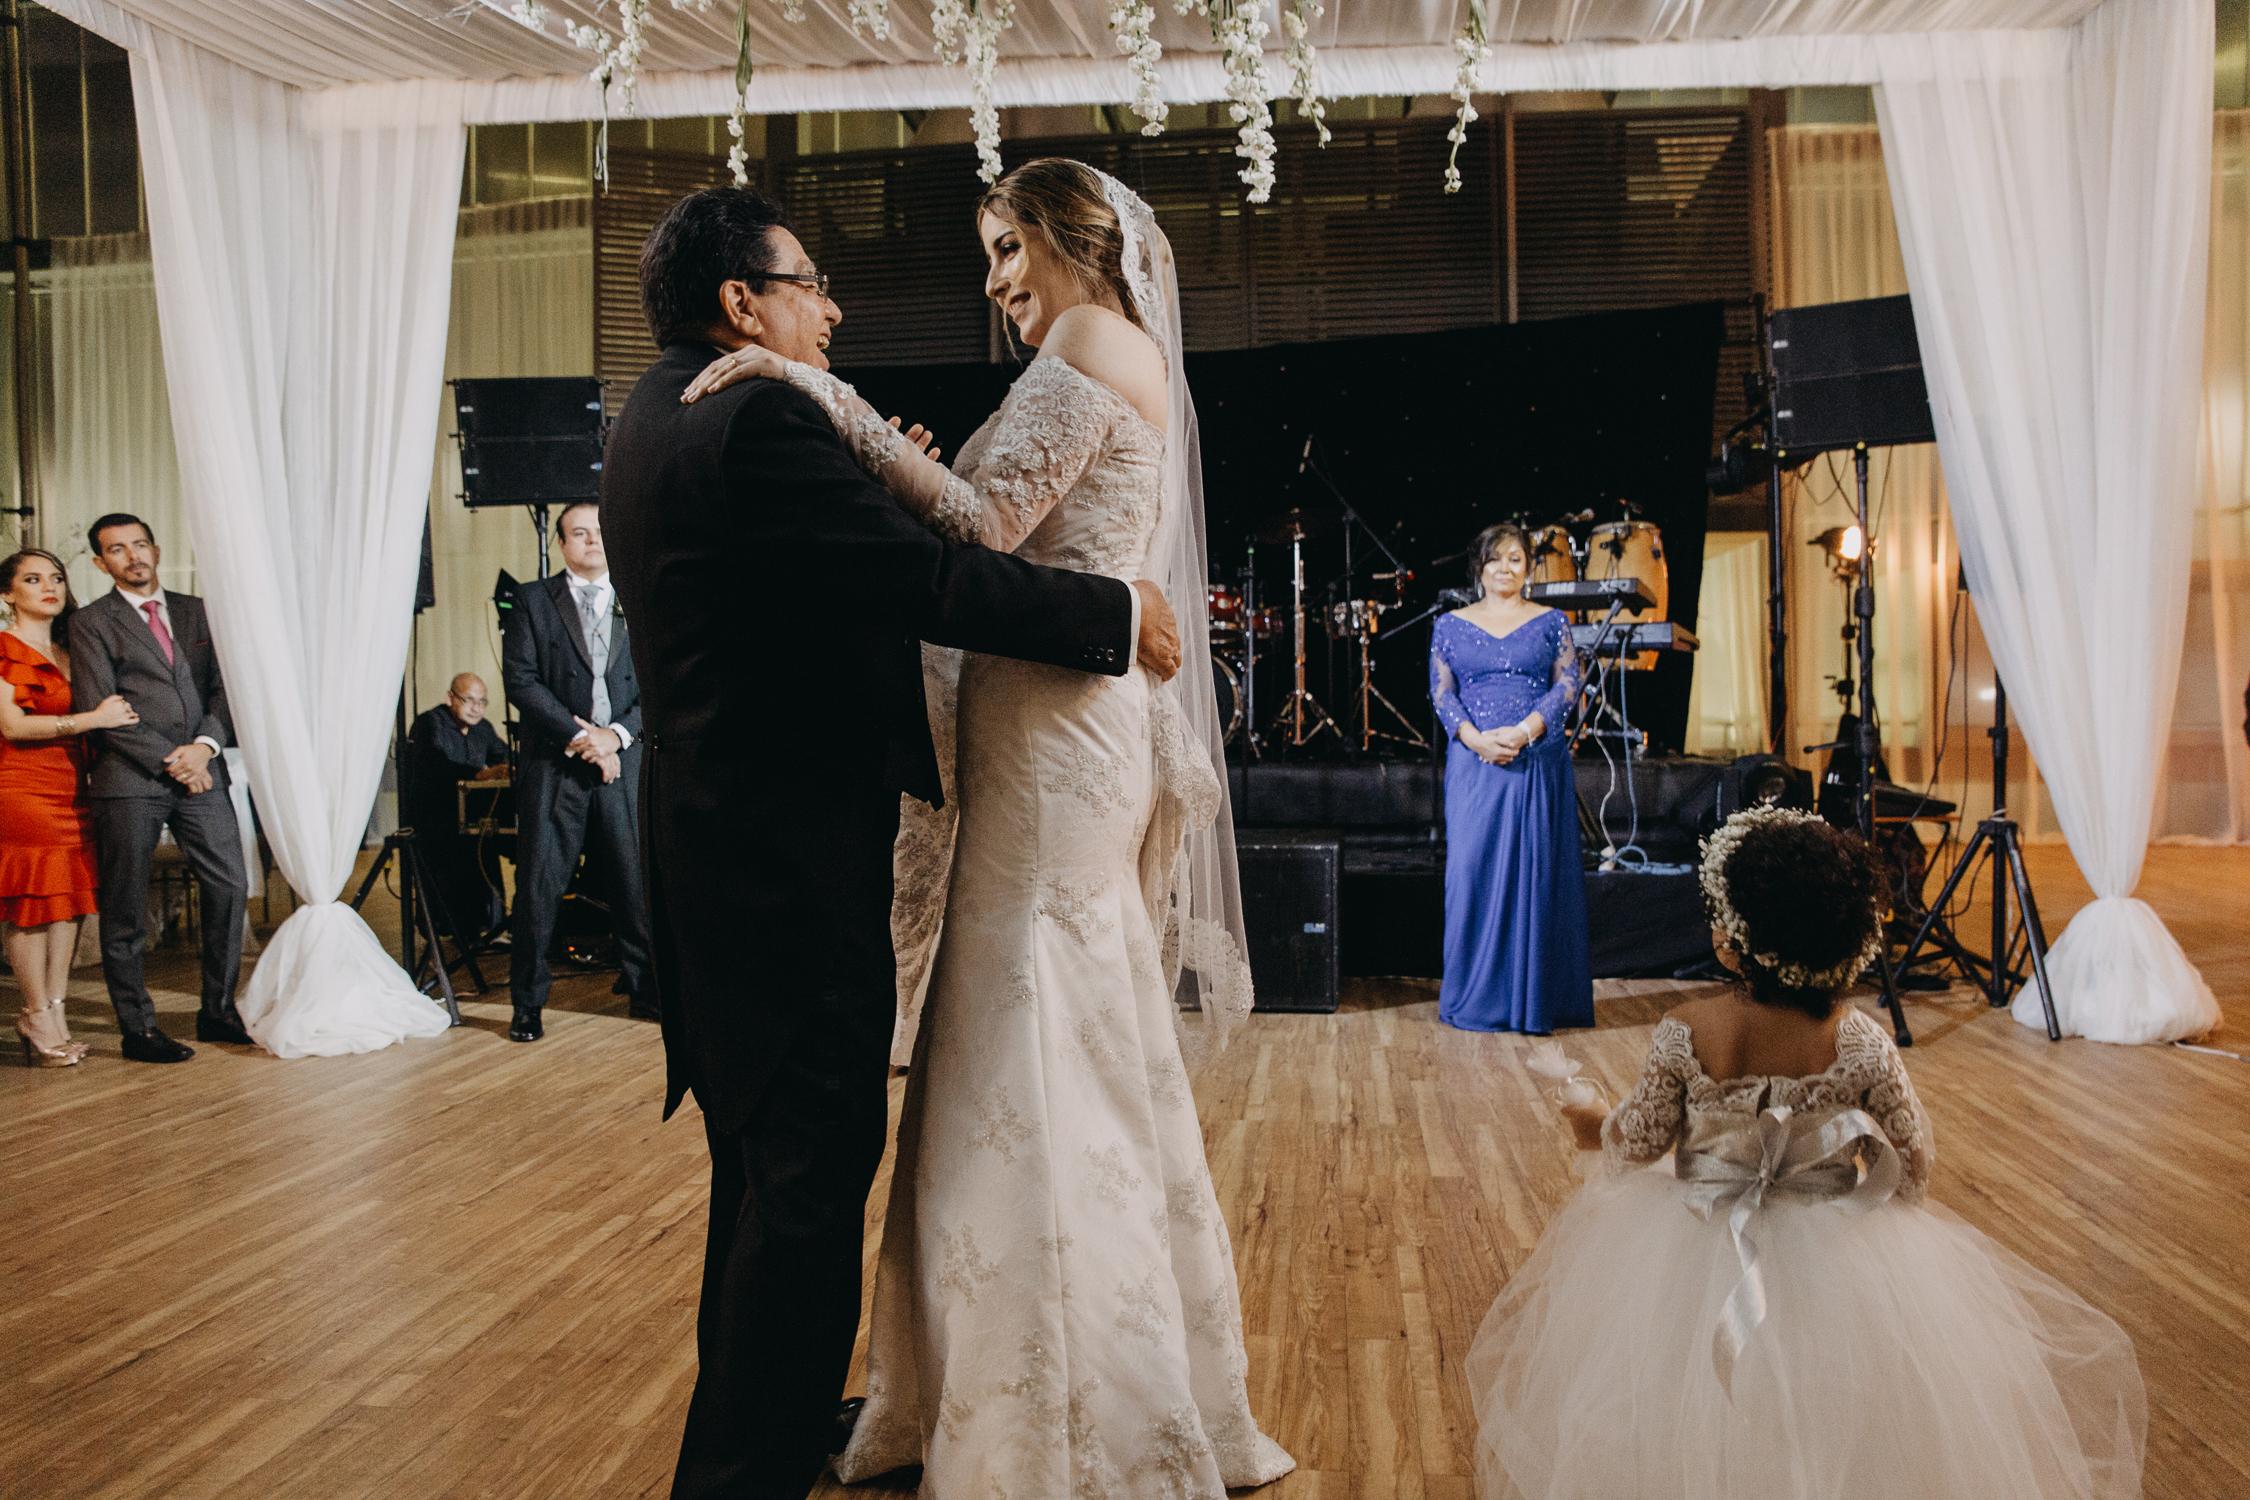 Michelle-Agurto-Fotografia-Bodas-Ecuador-Destination-Wedding-Photographer-Vicky-Javier-139.JPG